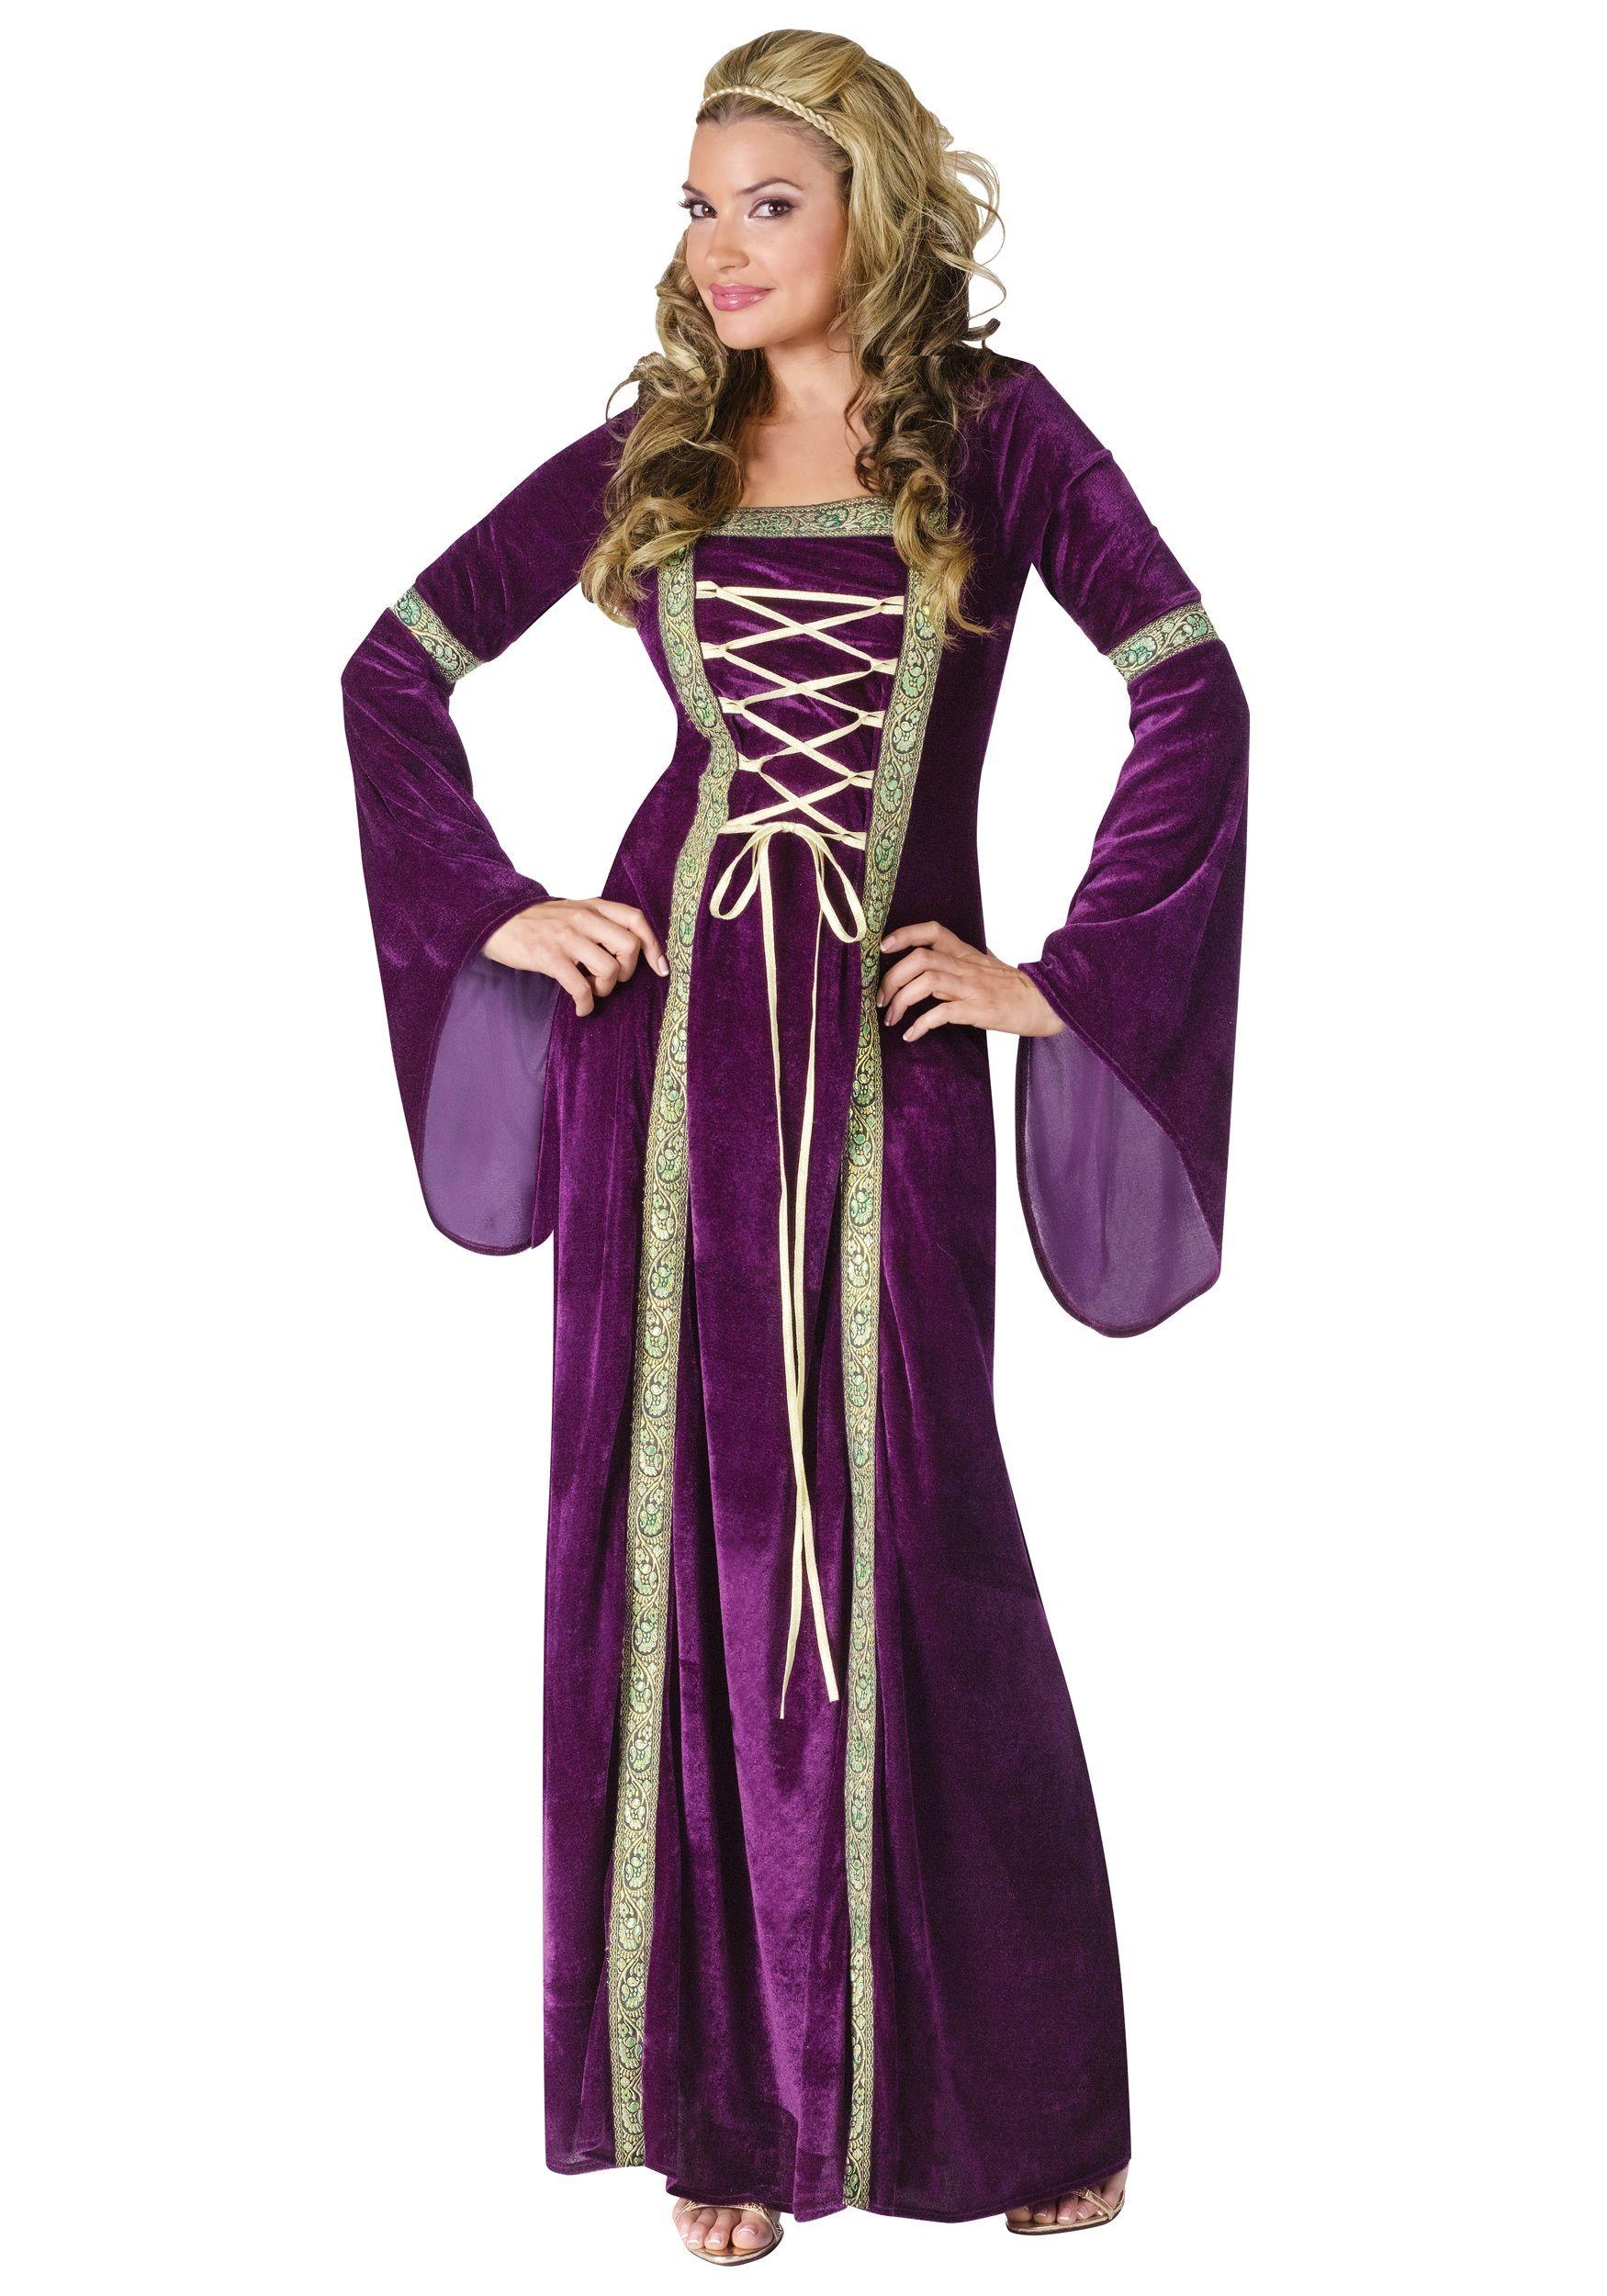 renaissance clothing  Google Search  Costumes  Pinterest  Ladies